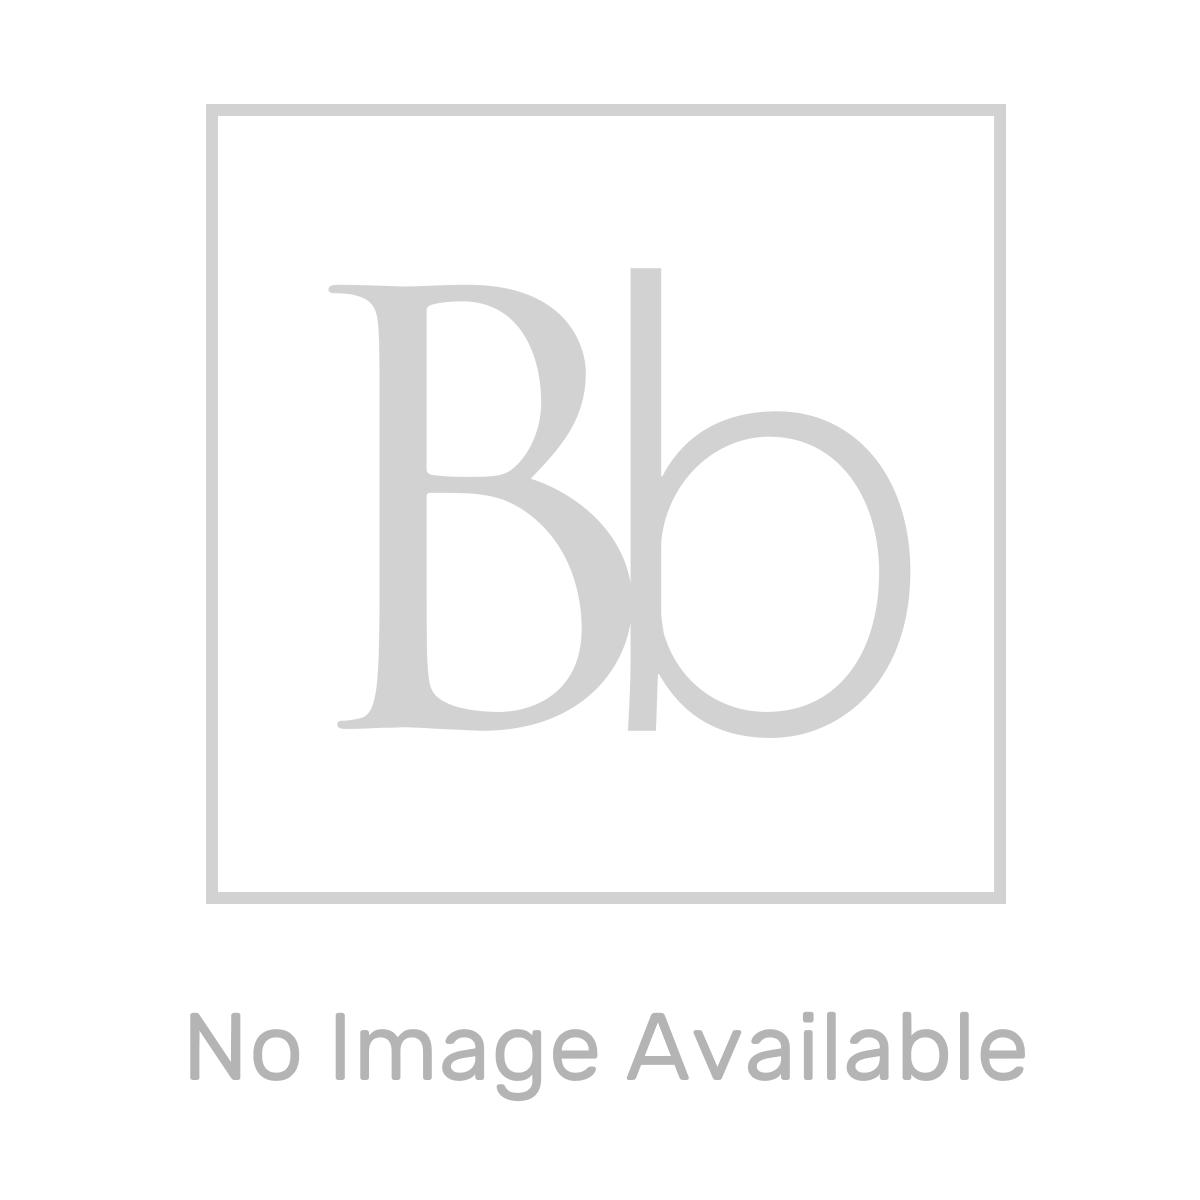 Nuie Athena Grey Avola 2 Drawer Floor Standing Vanity Unit with 40mm Profile Basin 800mm